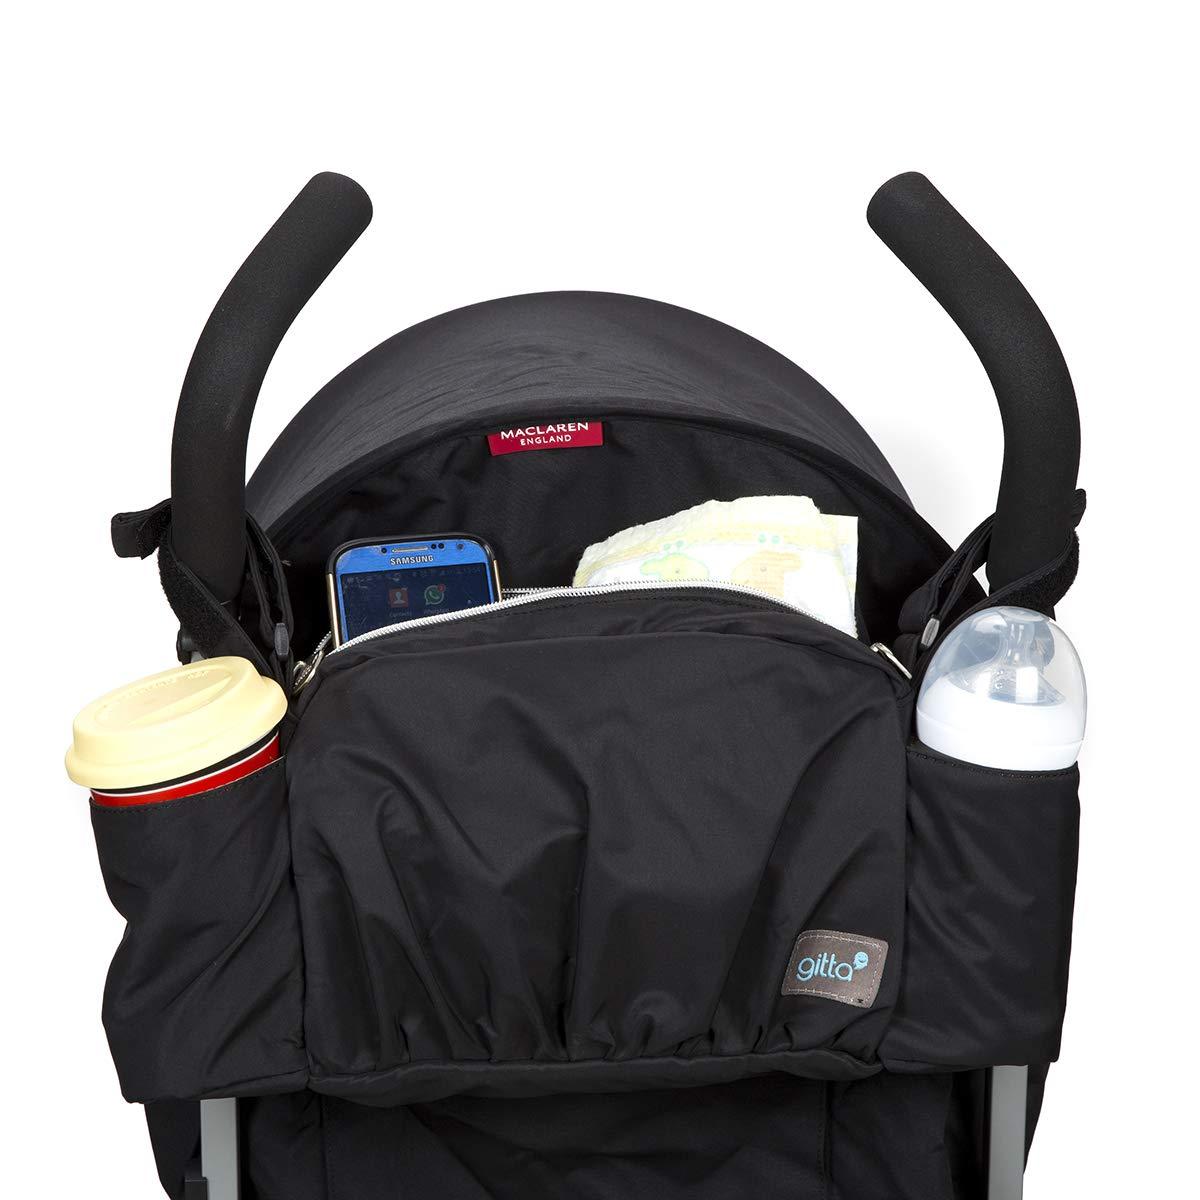 Gitta On The Go Baby Stroller Organizer Storage Holder Bag Bucket, Black by Gittabags (Image #4)